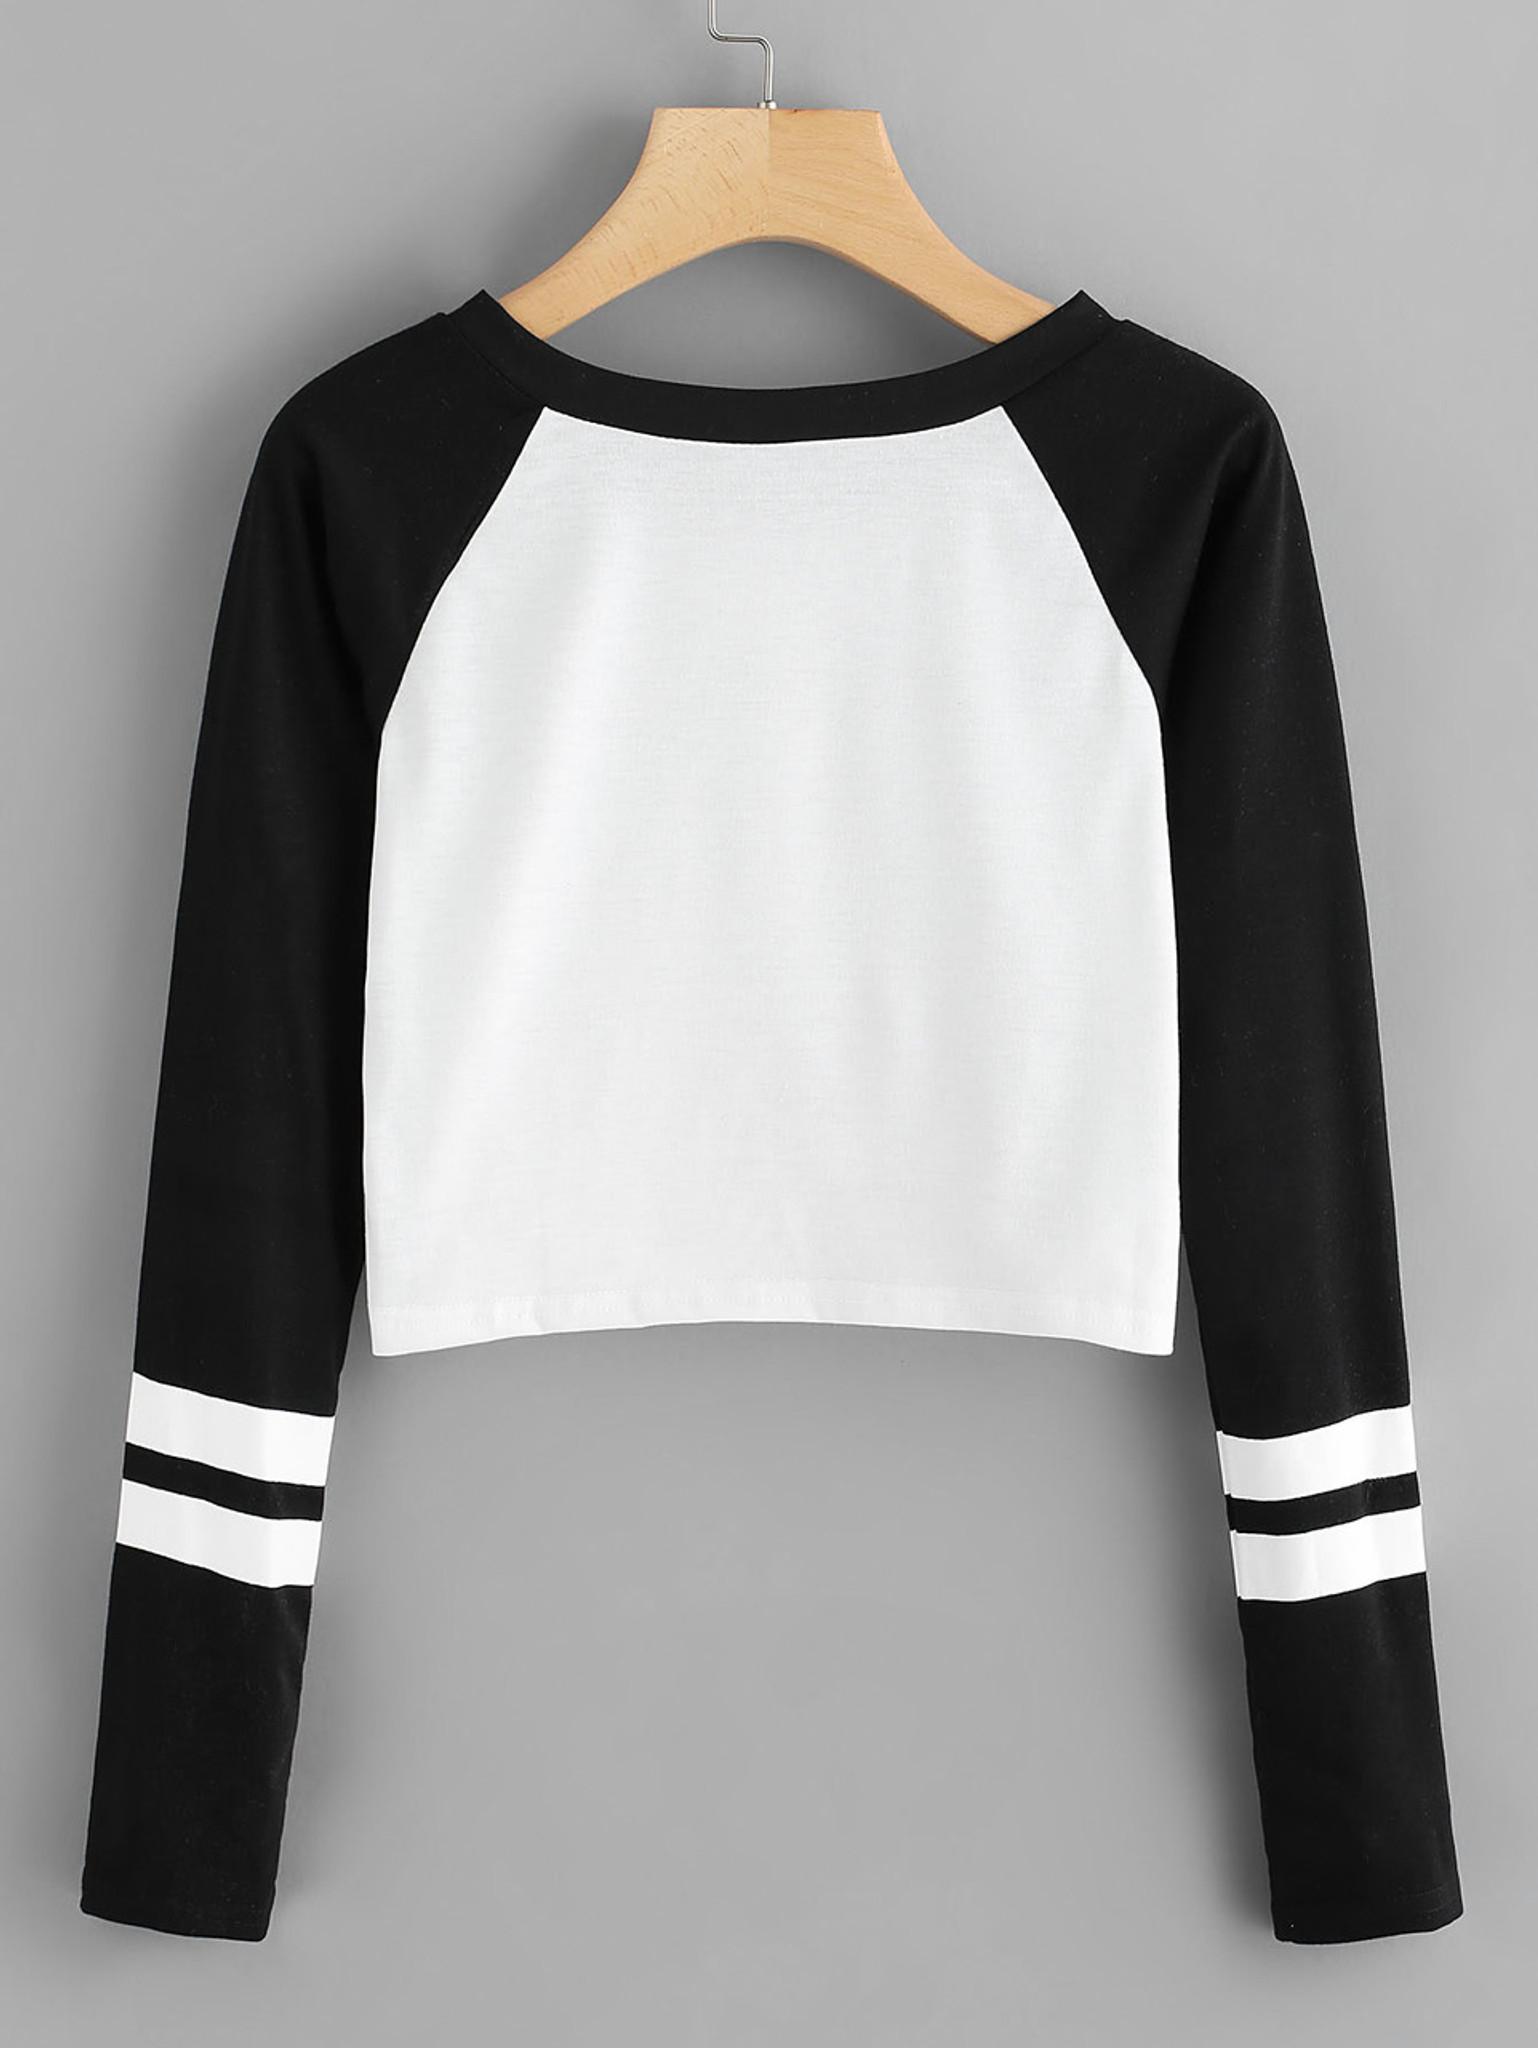 Fifth Avenue Women's Raglan Full Sleeve Sleeve Striped Crop T-Shirt - Black and White